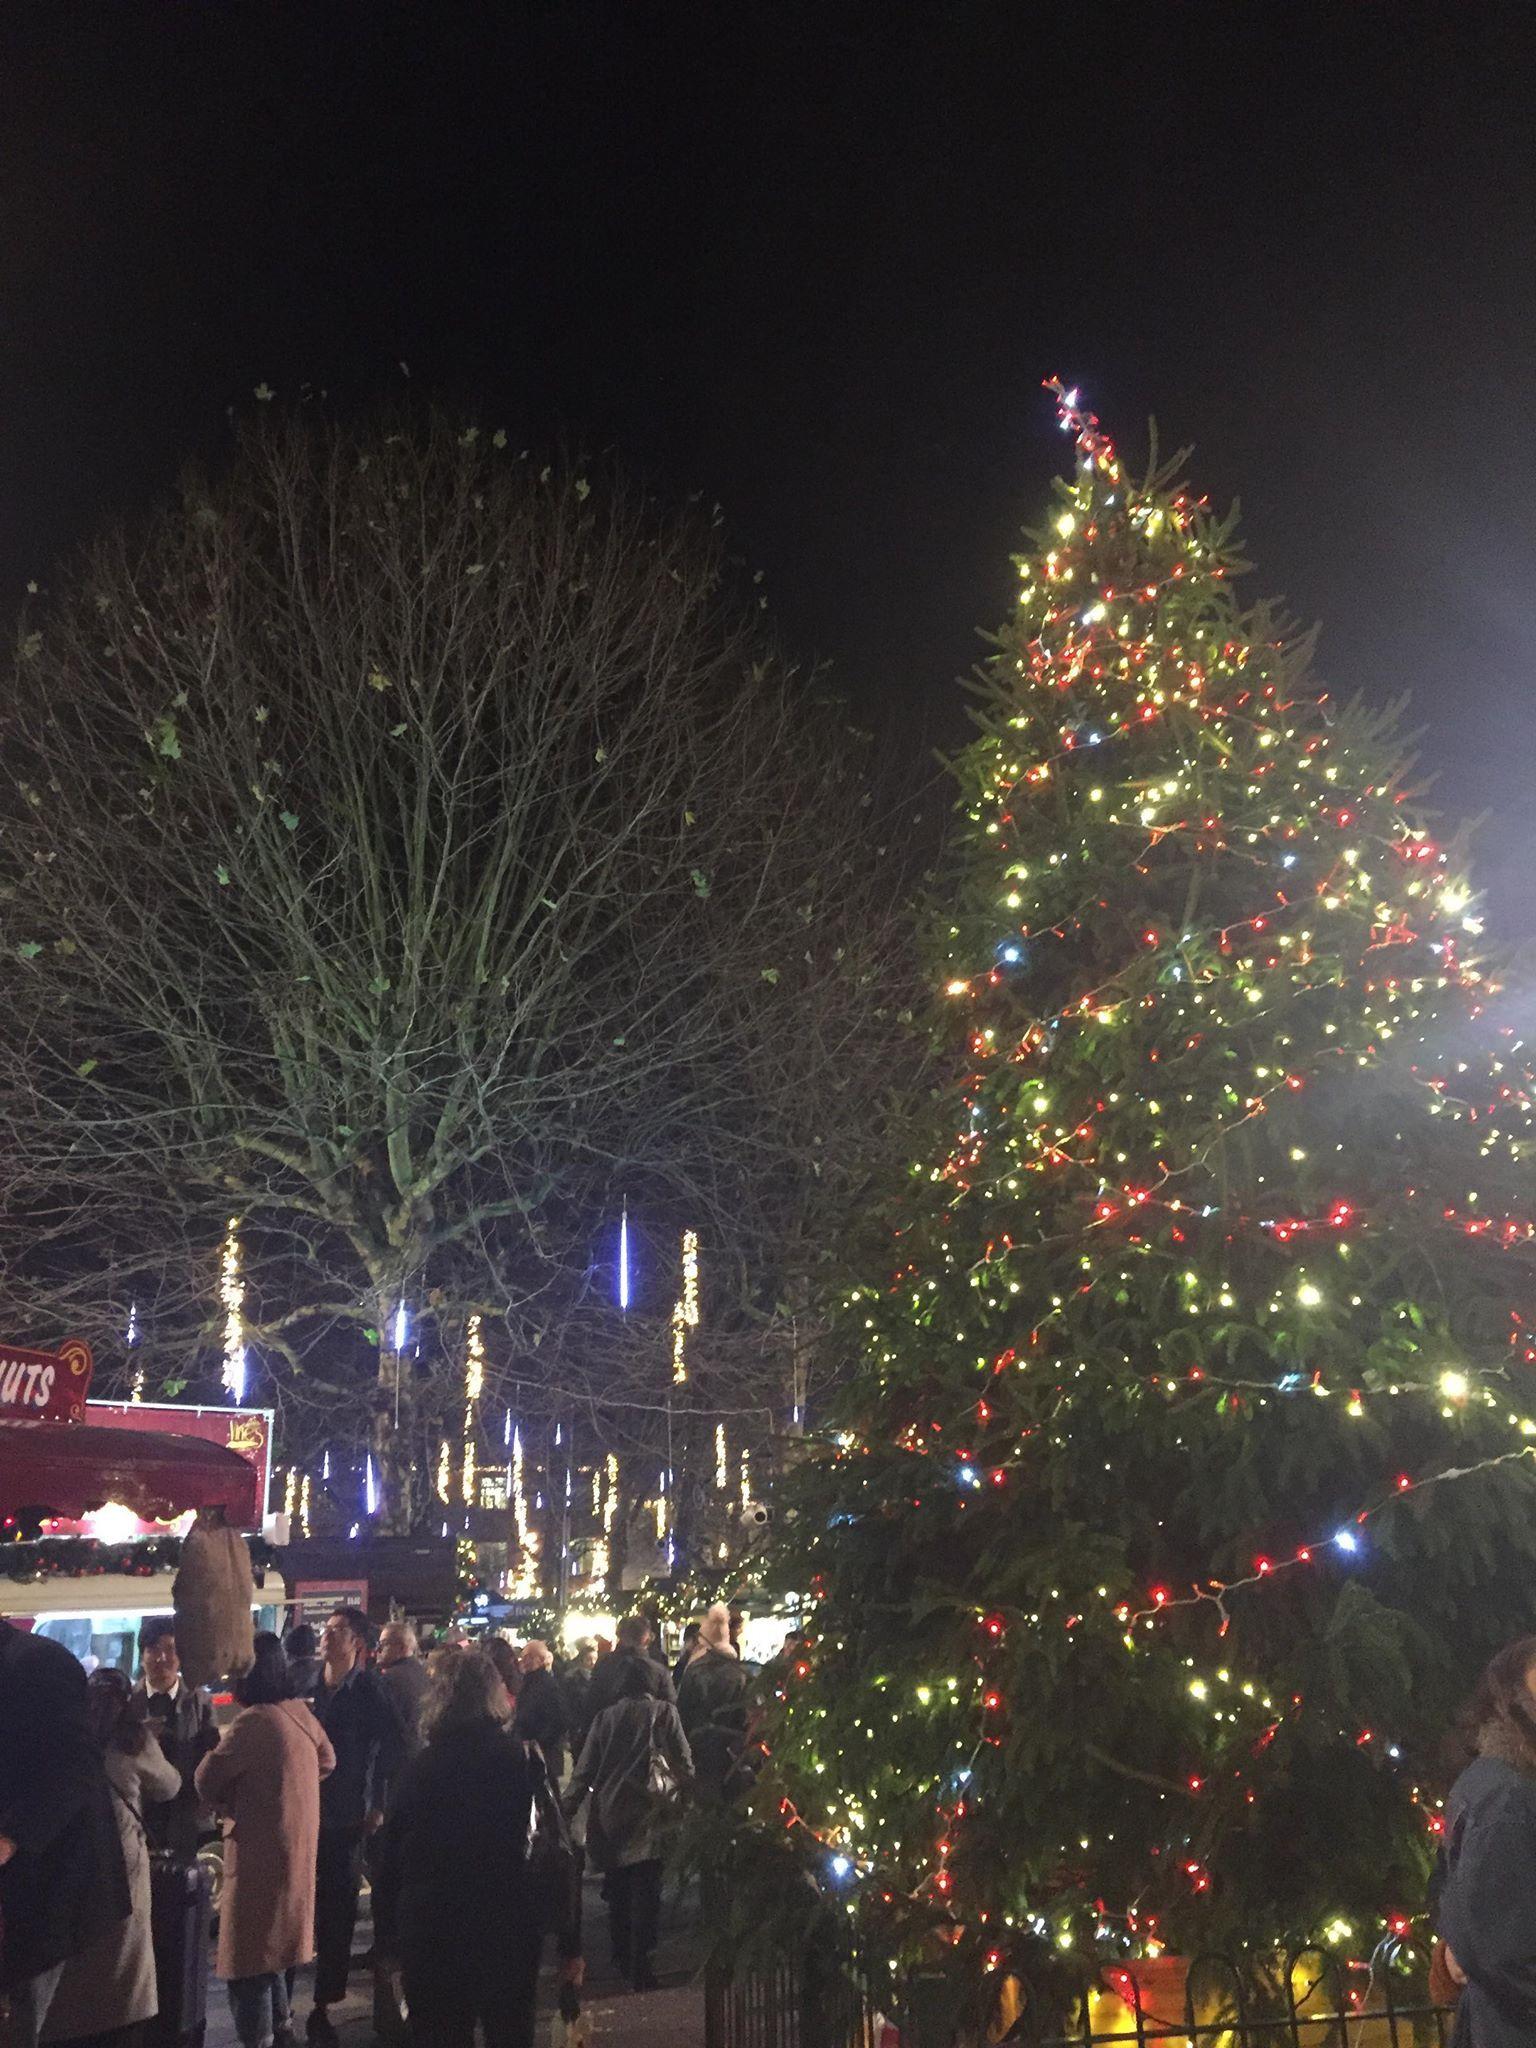 Image may contain: Crowd, Lighting, Night Life, Human, Person, Tree, Plant, Ornament, Christmas Tree